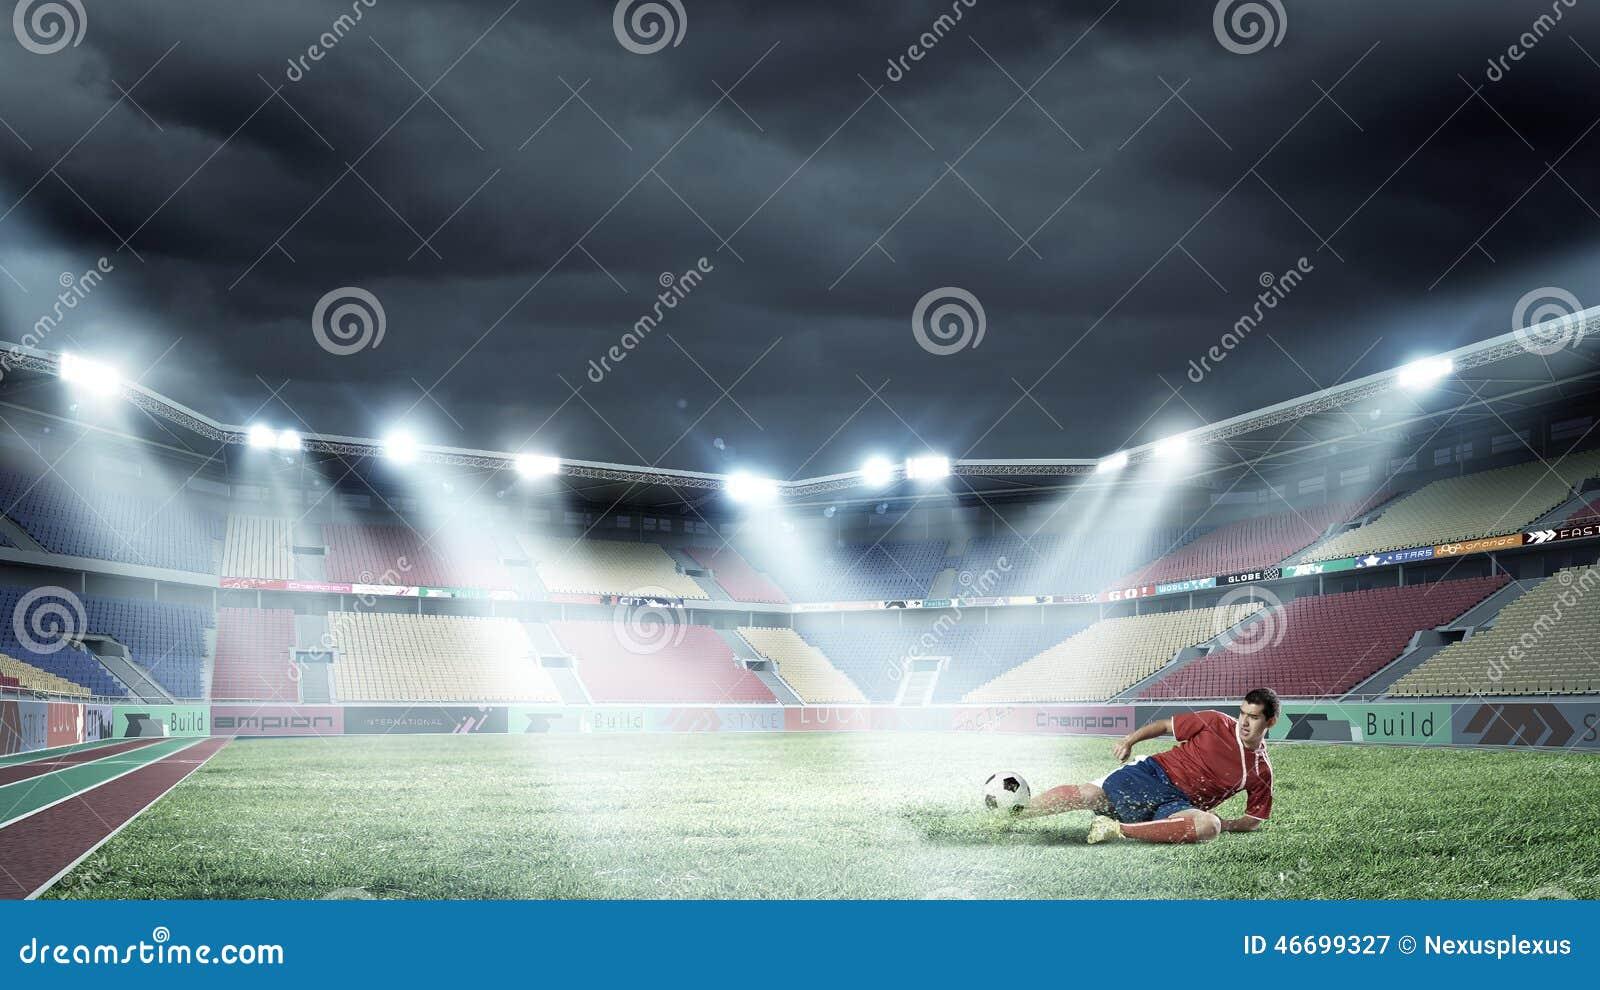 Seamless Vinyl Photography Backdrop Football Stadium Match: Football Kick Stock Photo